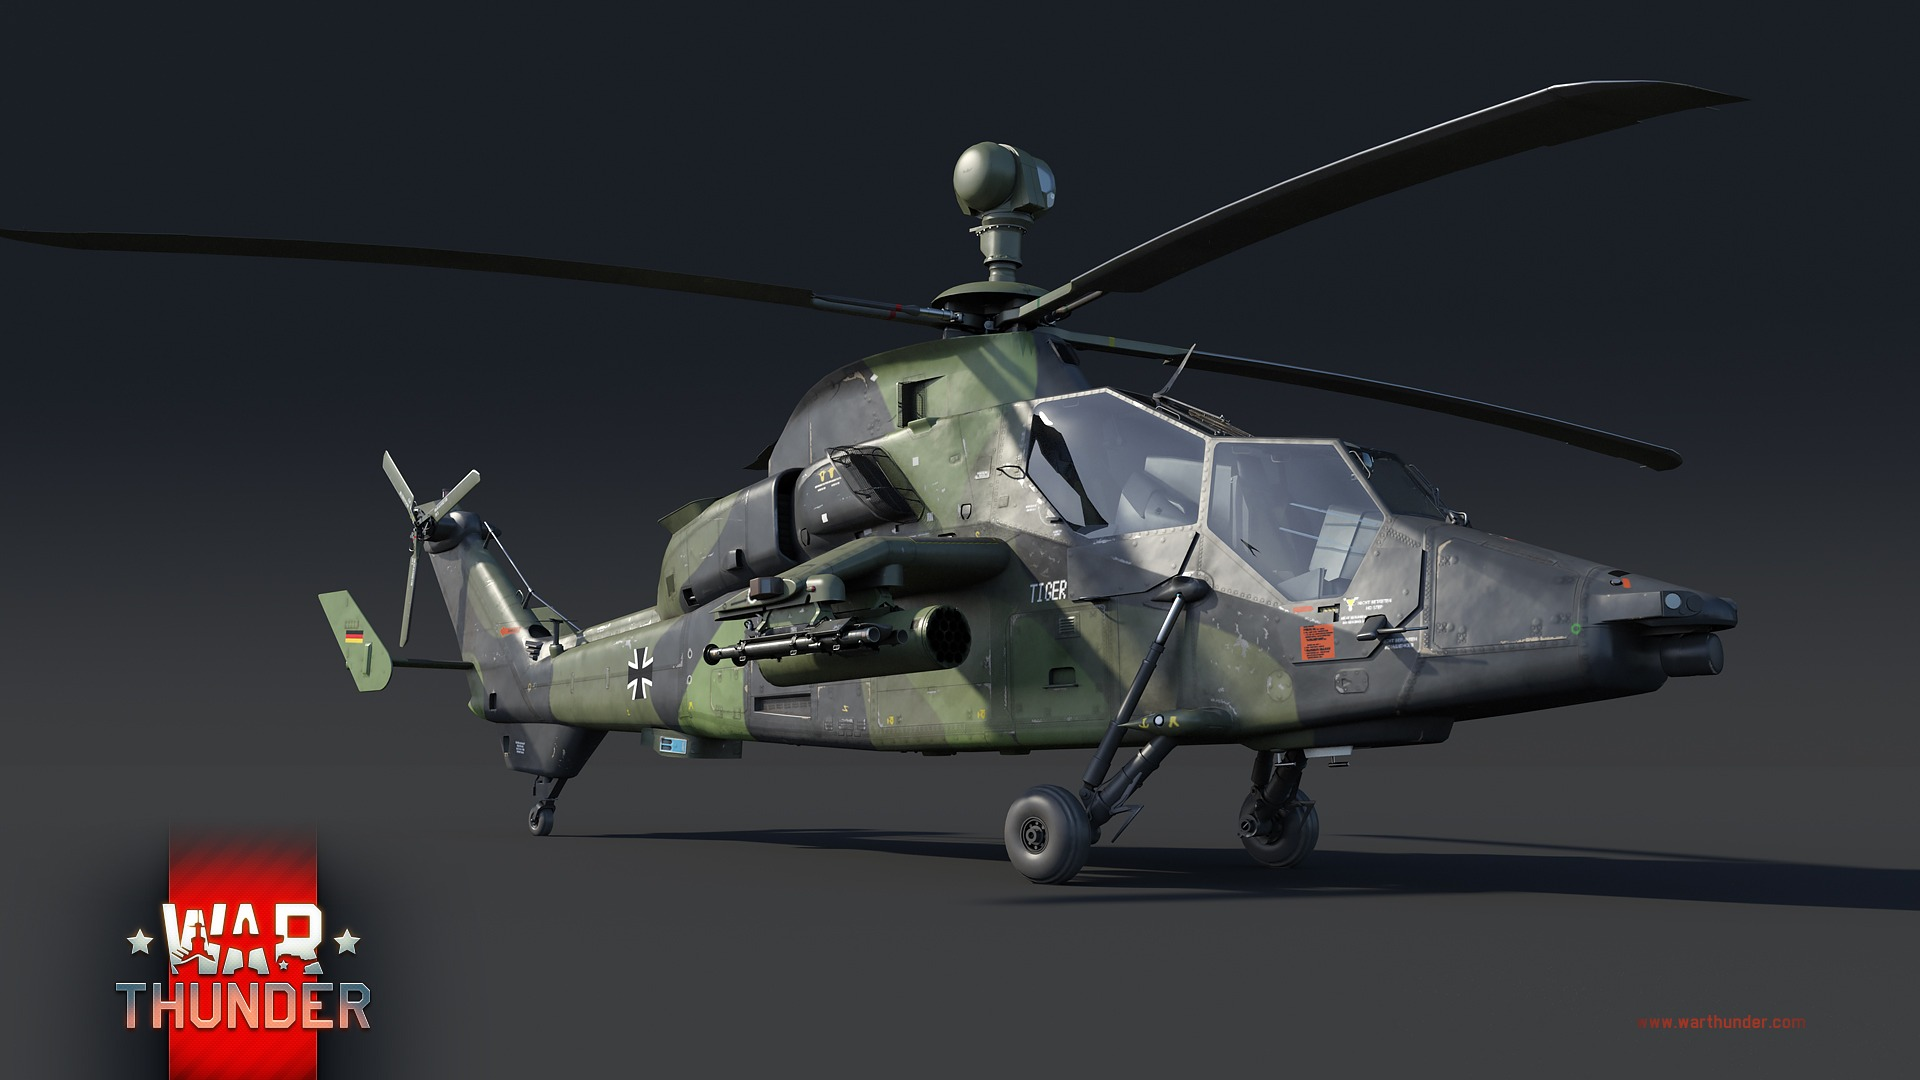 eurocopter_tiger_1920x1080_logo_com_873cc5a6f31782b445f9c8f3371b773d